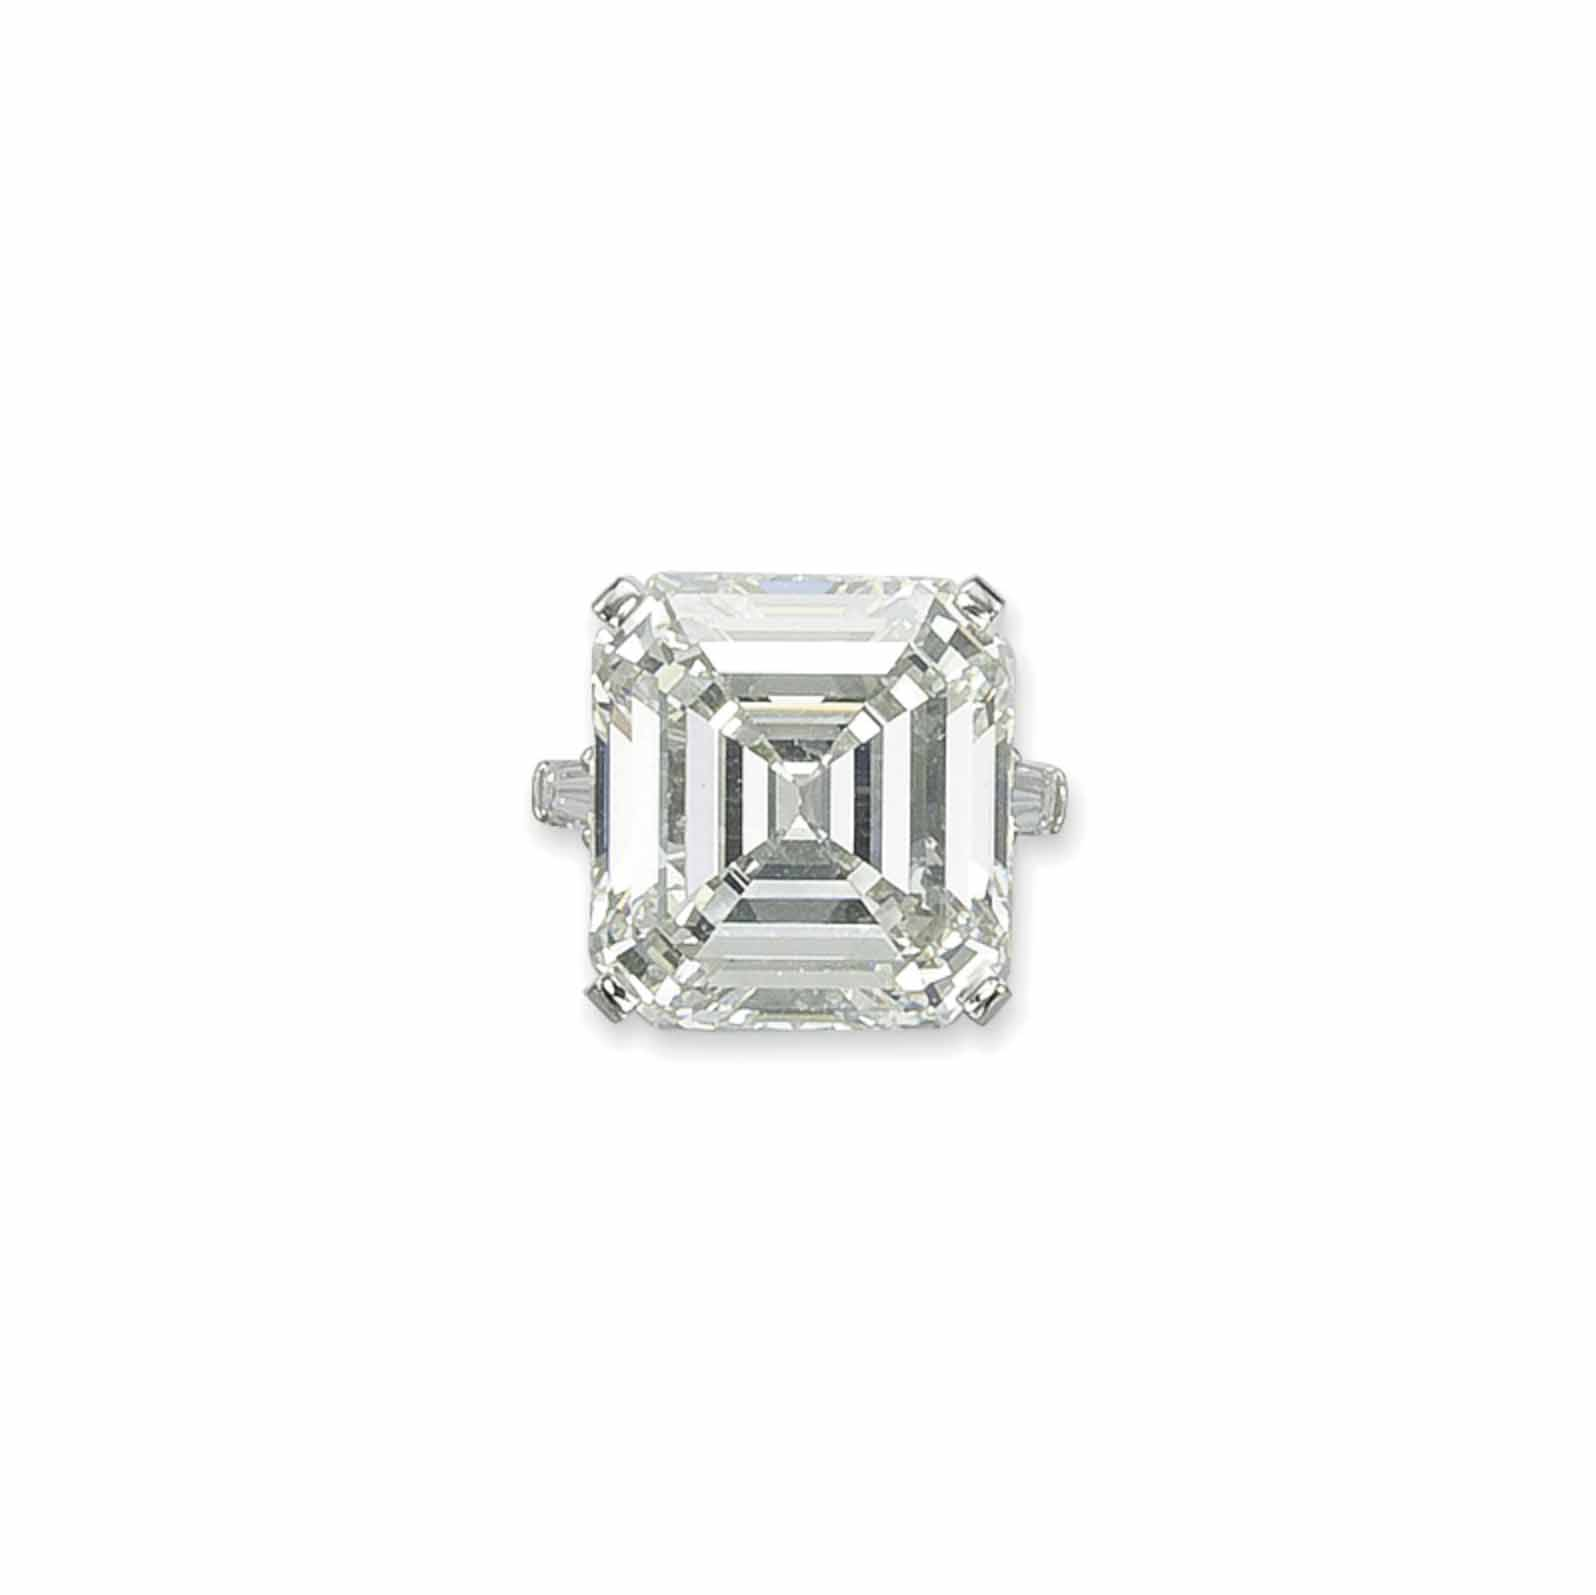 AN IMPRESSIVE DIAMOND RING, BY